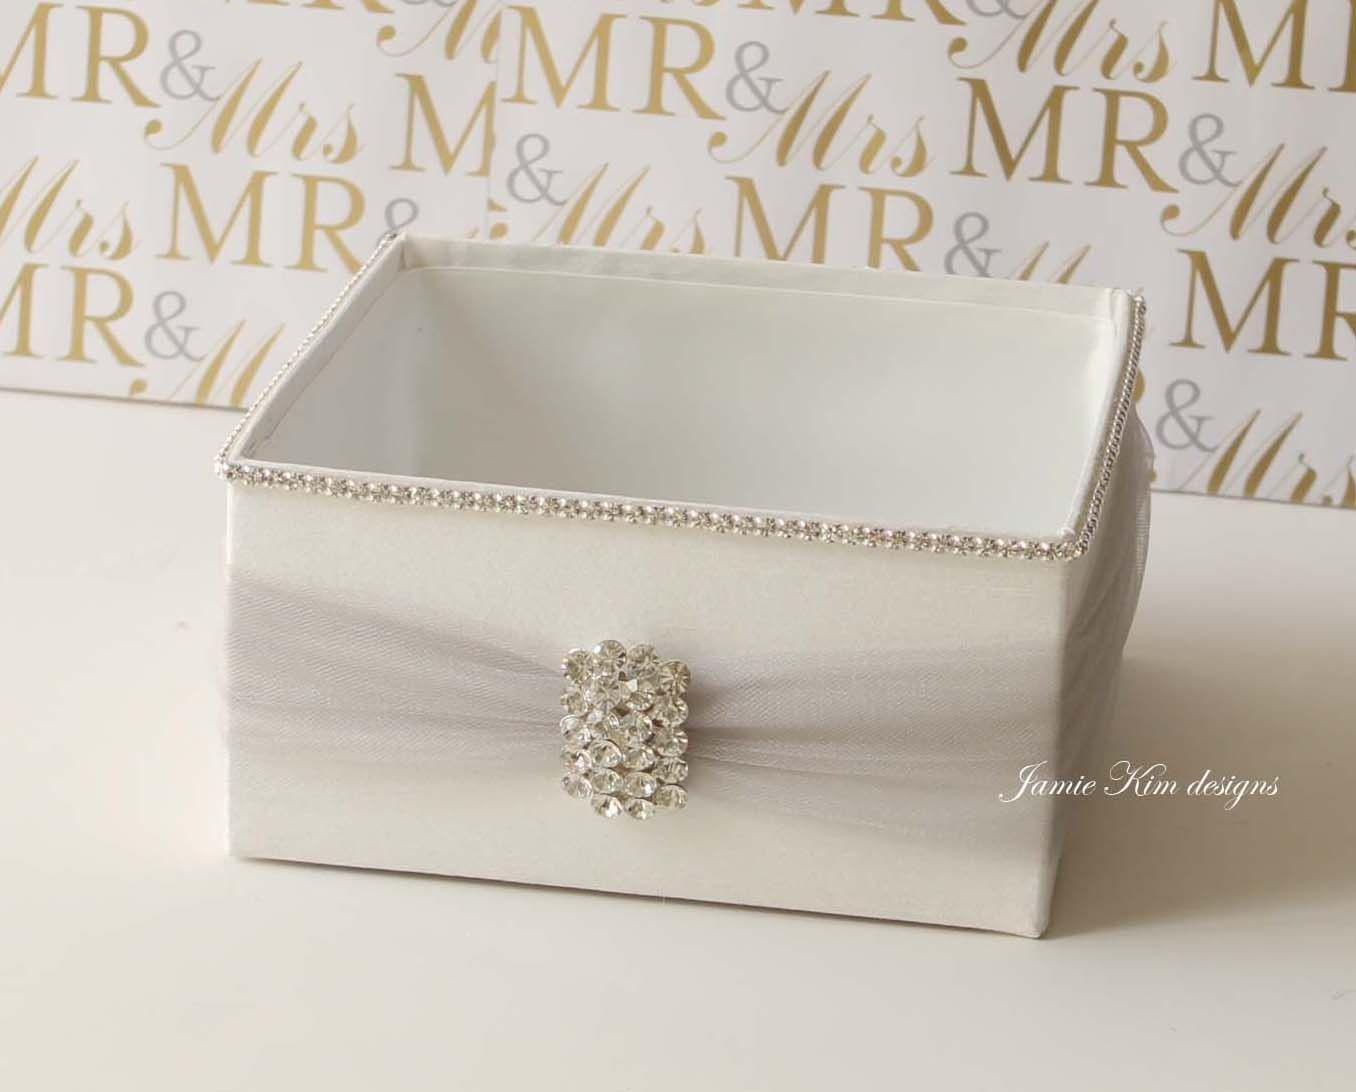 Wedding Open Box Program Custom Made To Order 40 00 Via Etsy